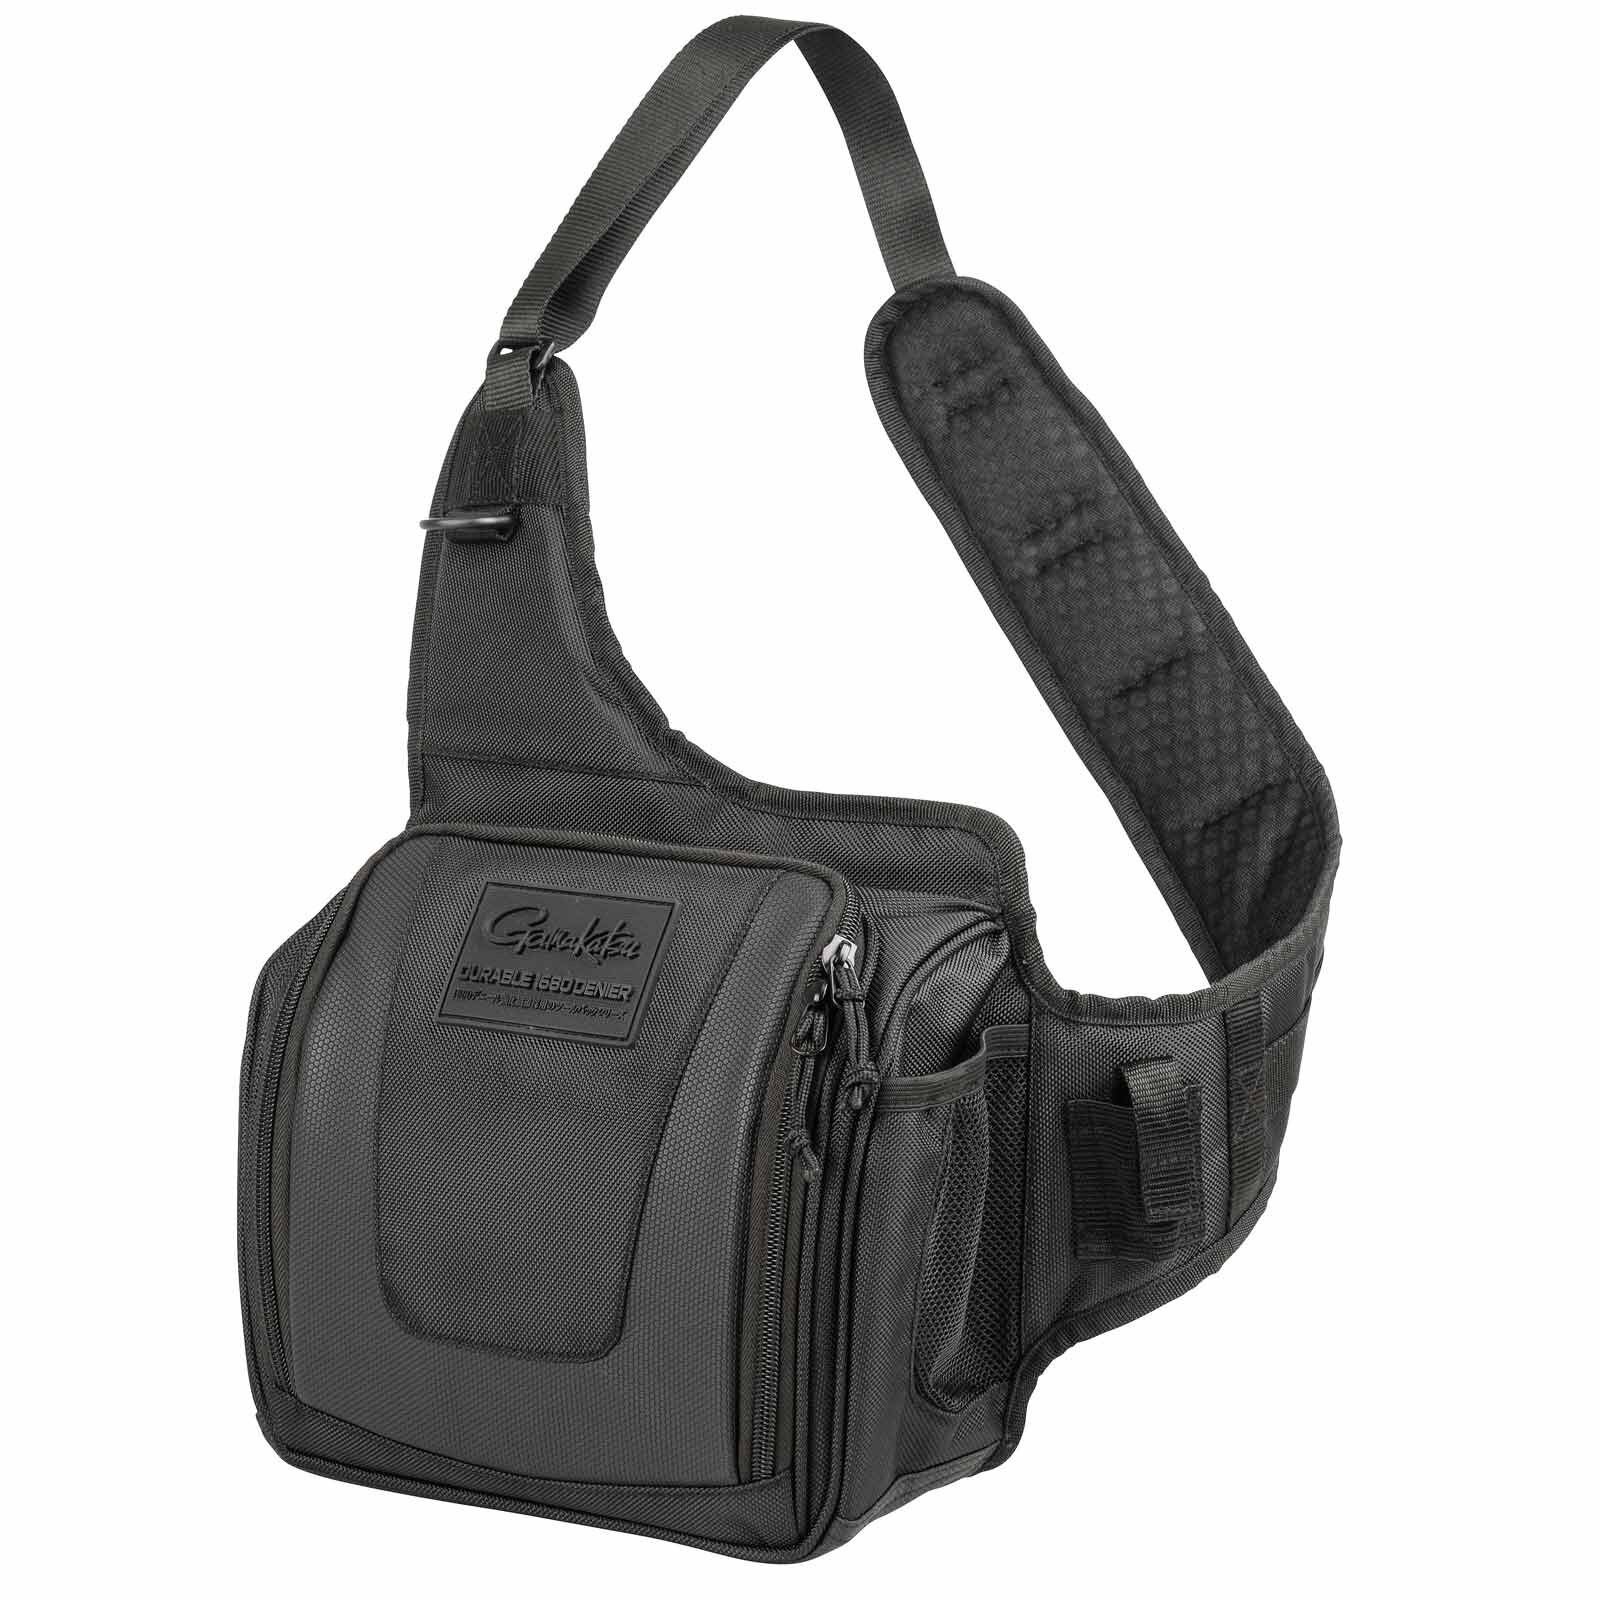 GAMAKATSU Angel Borsa CON SCATOLE-shoulder bag 40x40x9cm